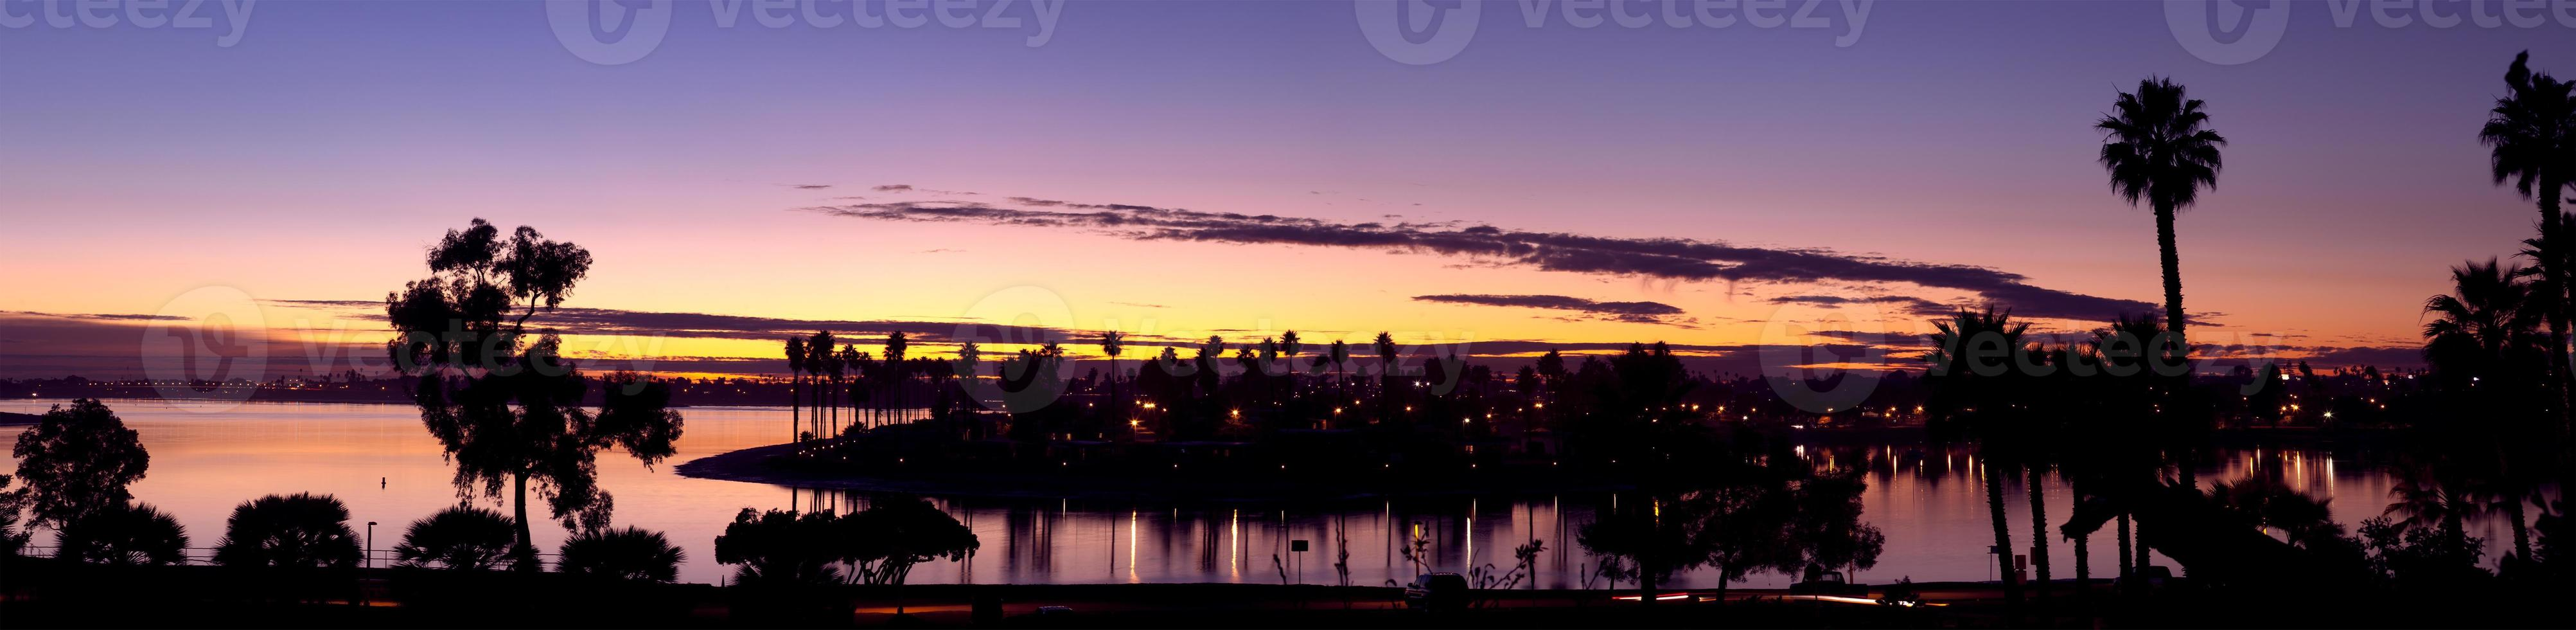 mission bay san diego, california usa, skymning solnedgång foto